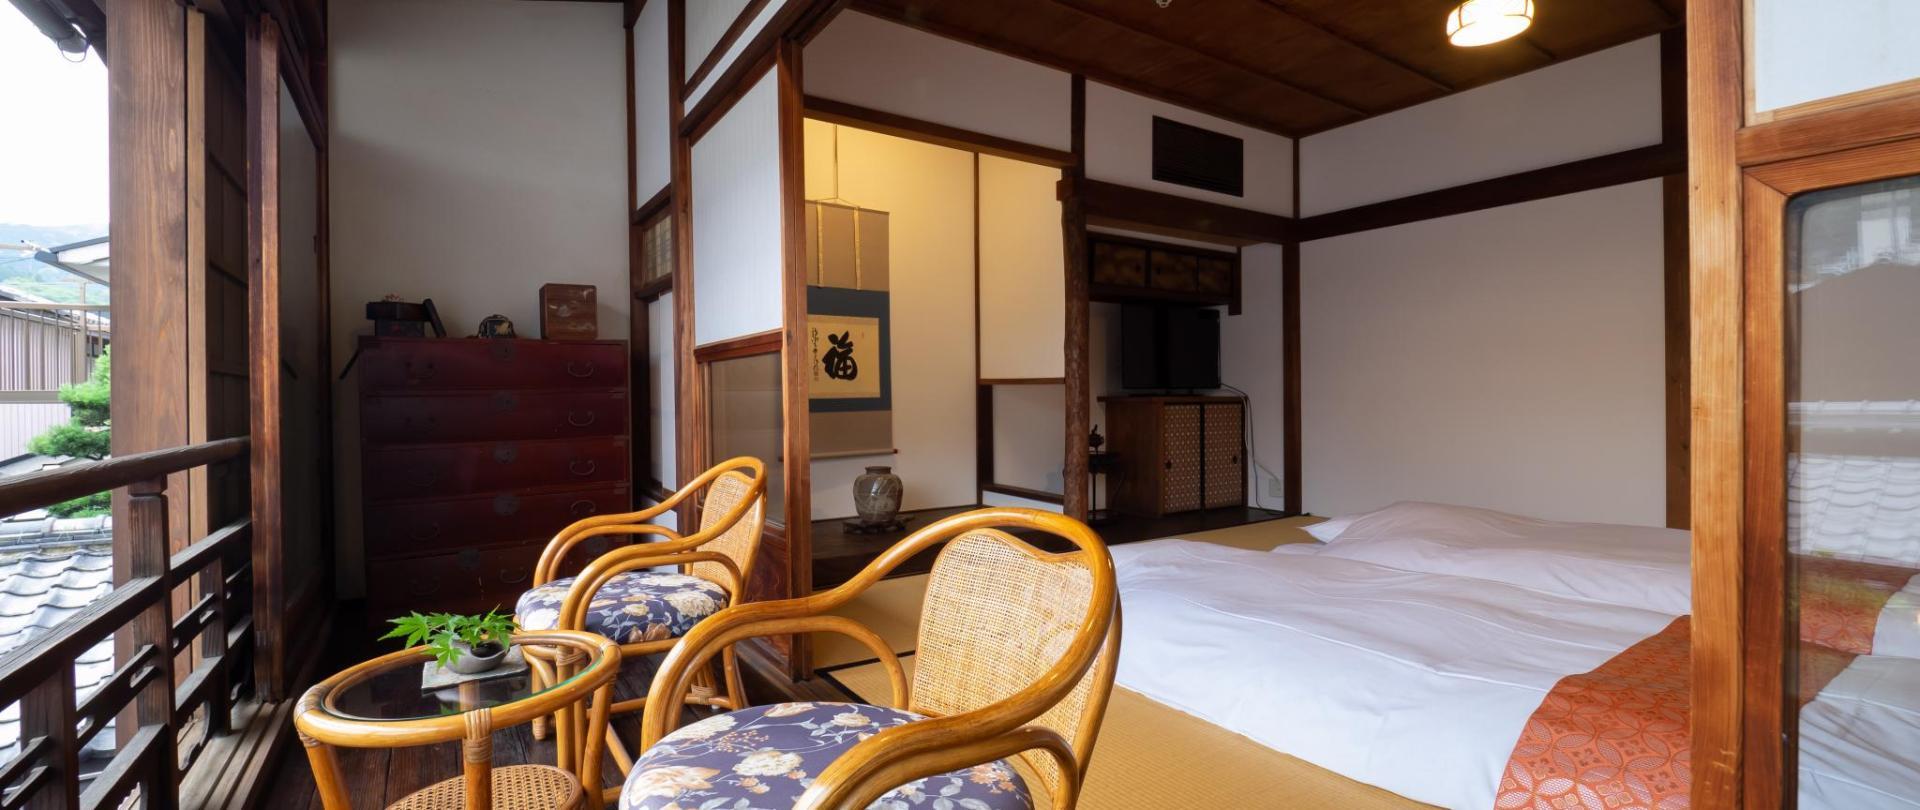 Inase Otsu Machiya Bed and Breakfast